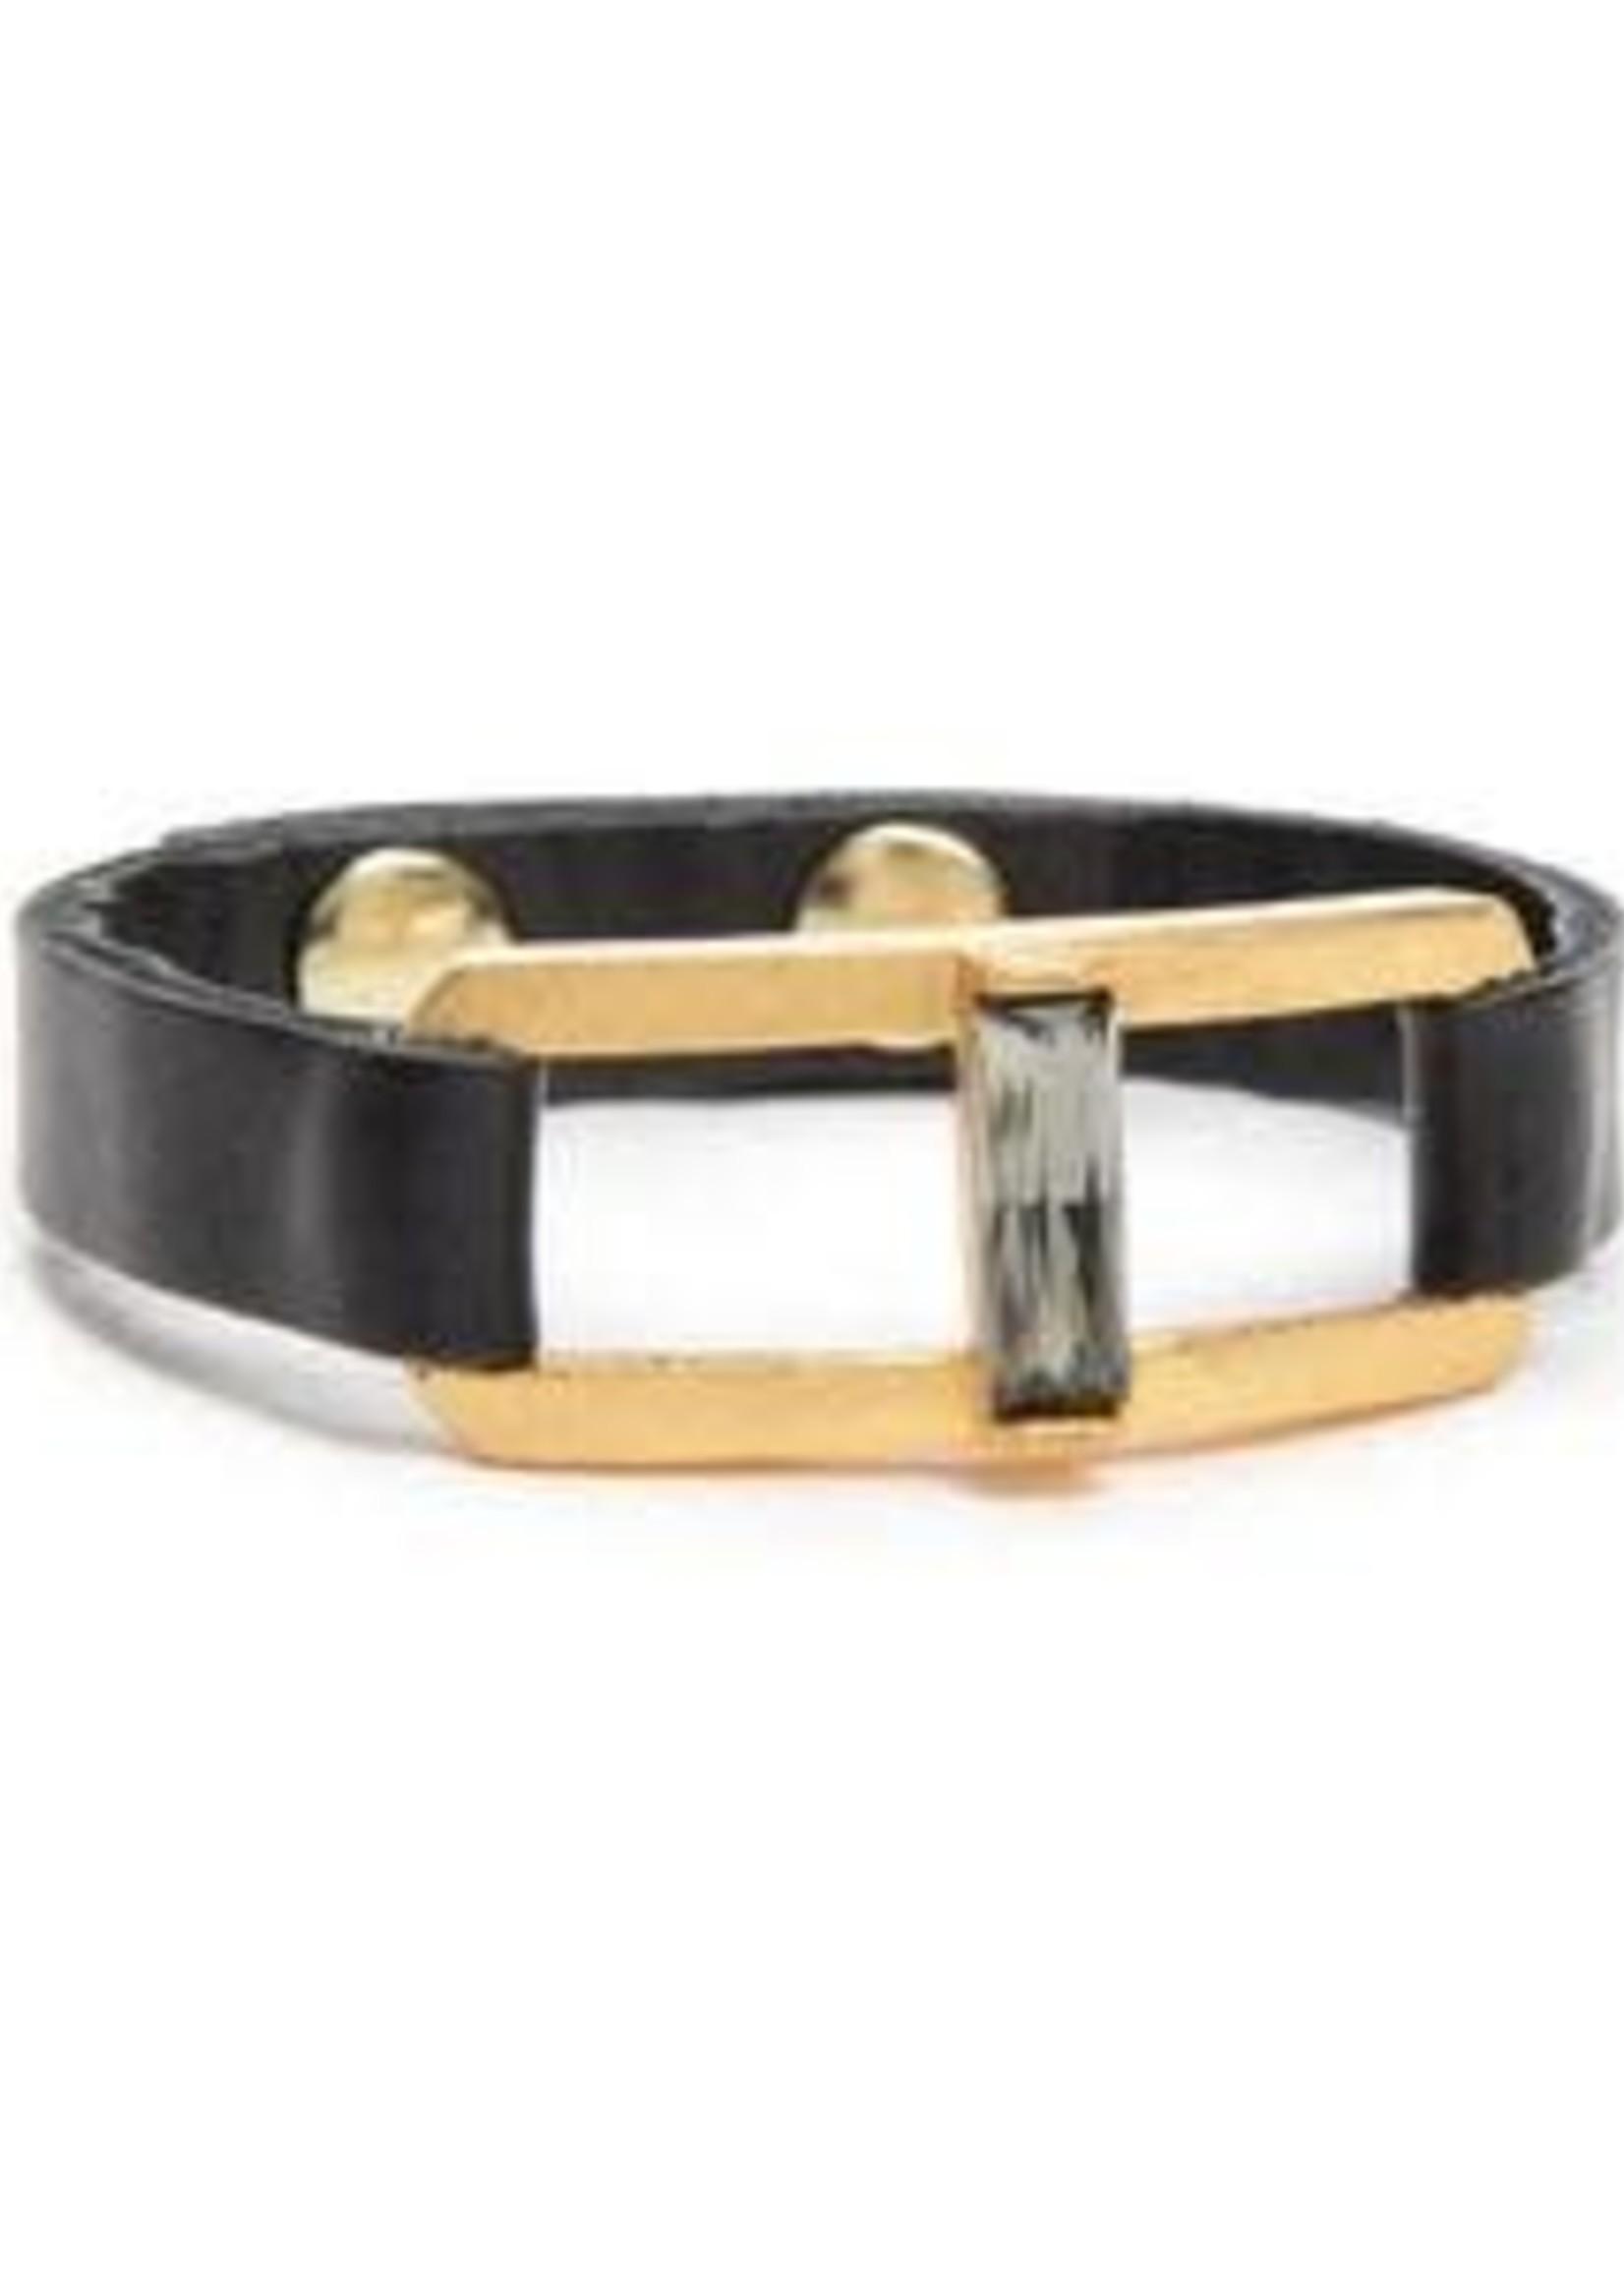 Rebel Designs Rebel - Gold Plate Bracelet w/Topaz Stone (RR1077)